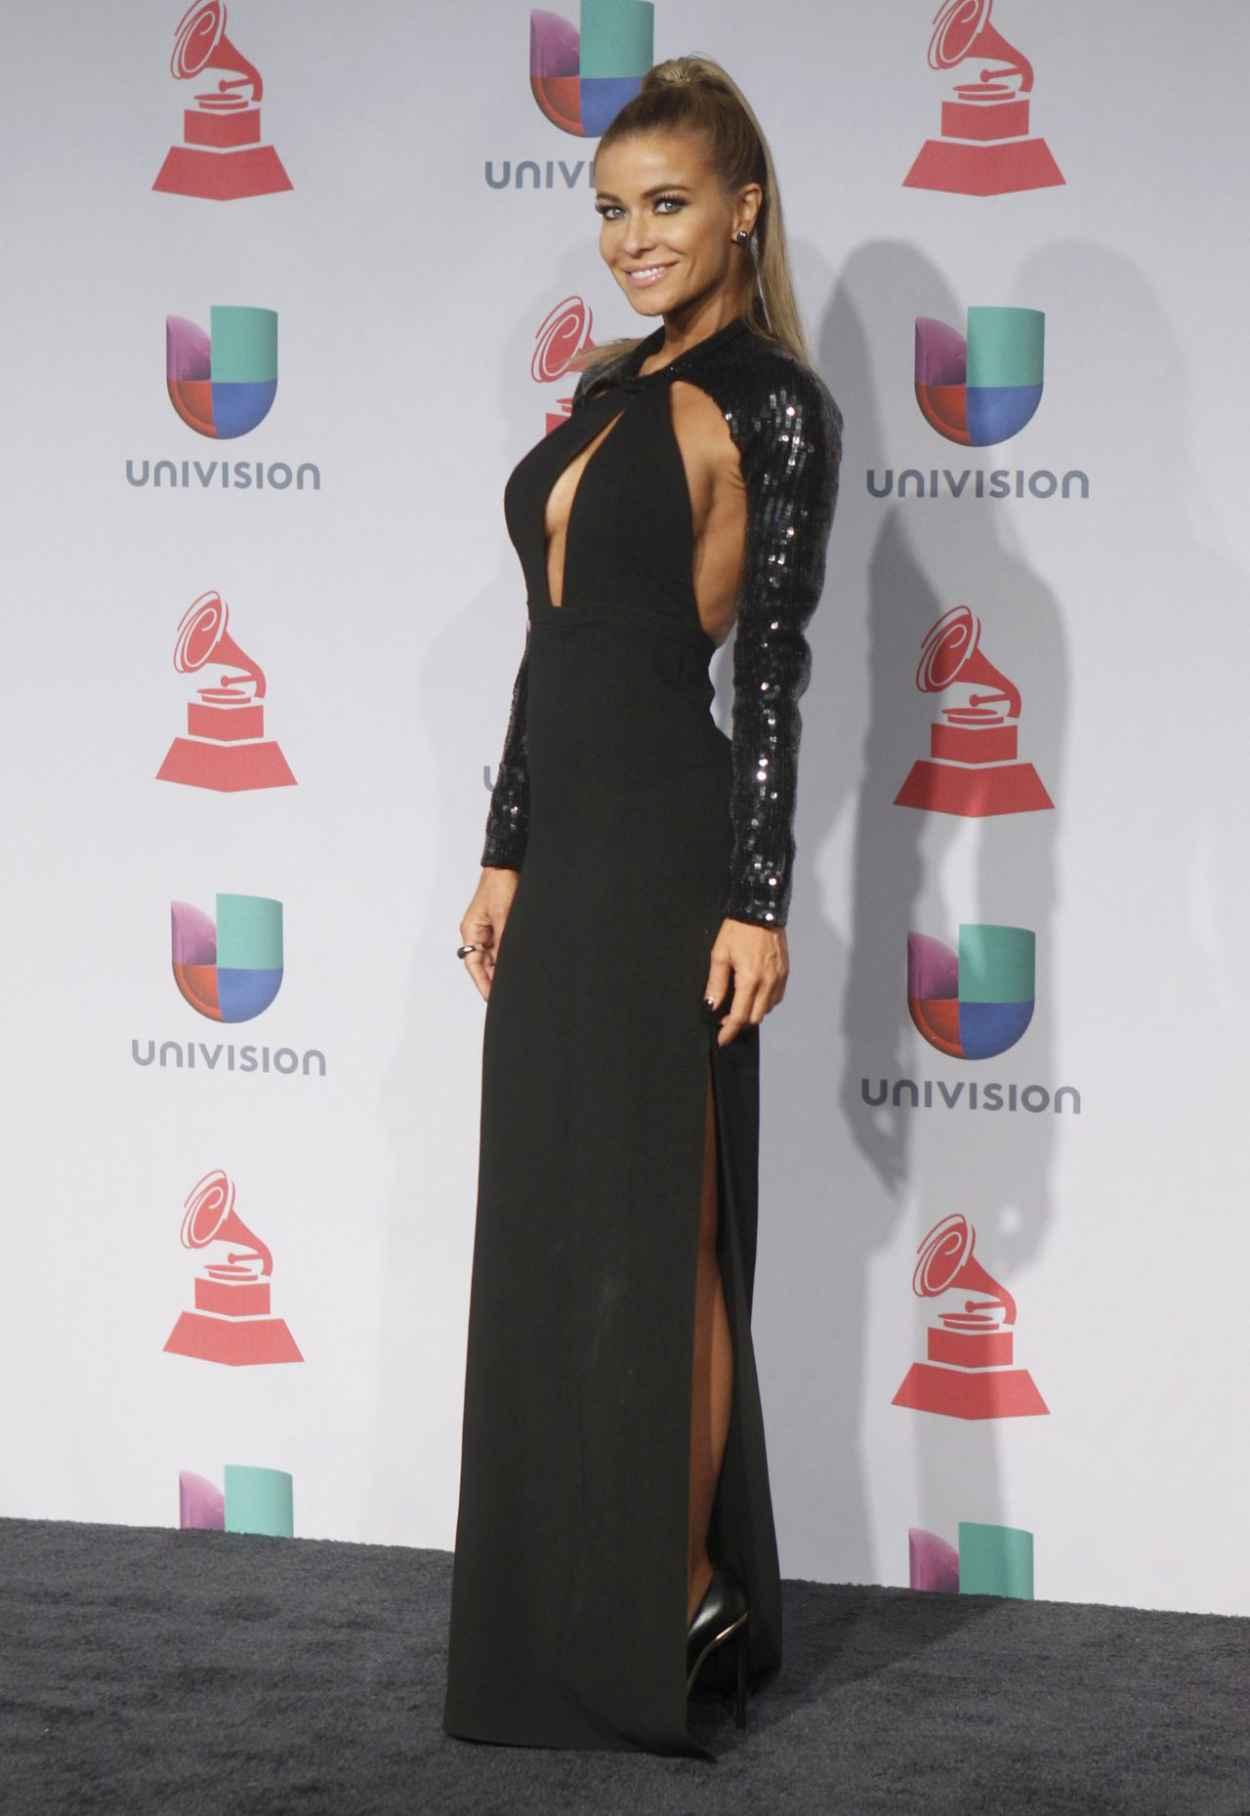 Carmen Electra on Red Carpet - 14th Annual Latin GRAMMY Awards in Las Vegas - November 2015-1